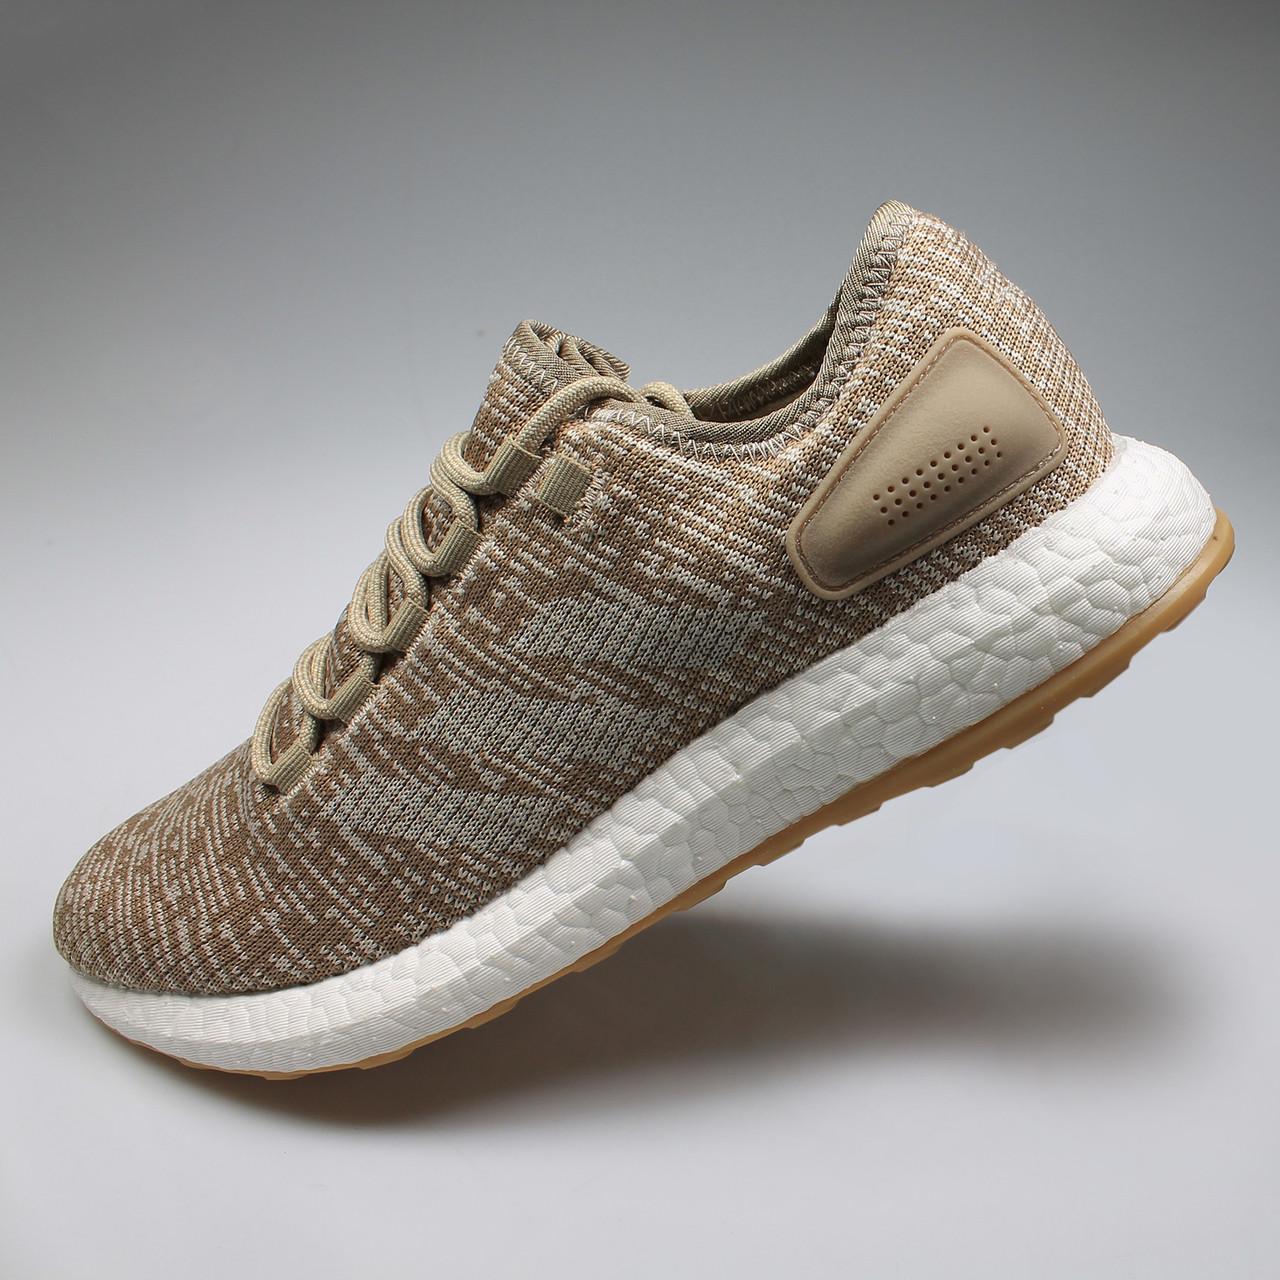 f7110c72a ... Adidas PureBOOST Mens Sneakers S81992 - Khaki